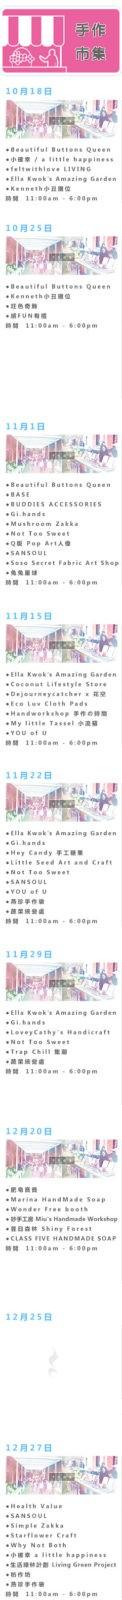 timetable_L1227